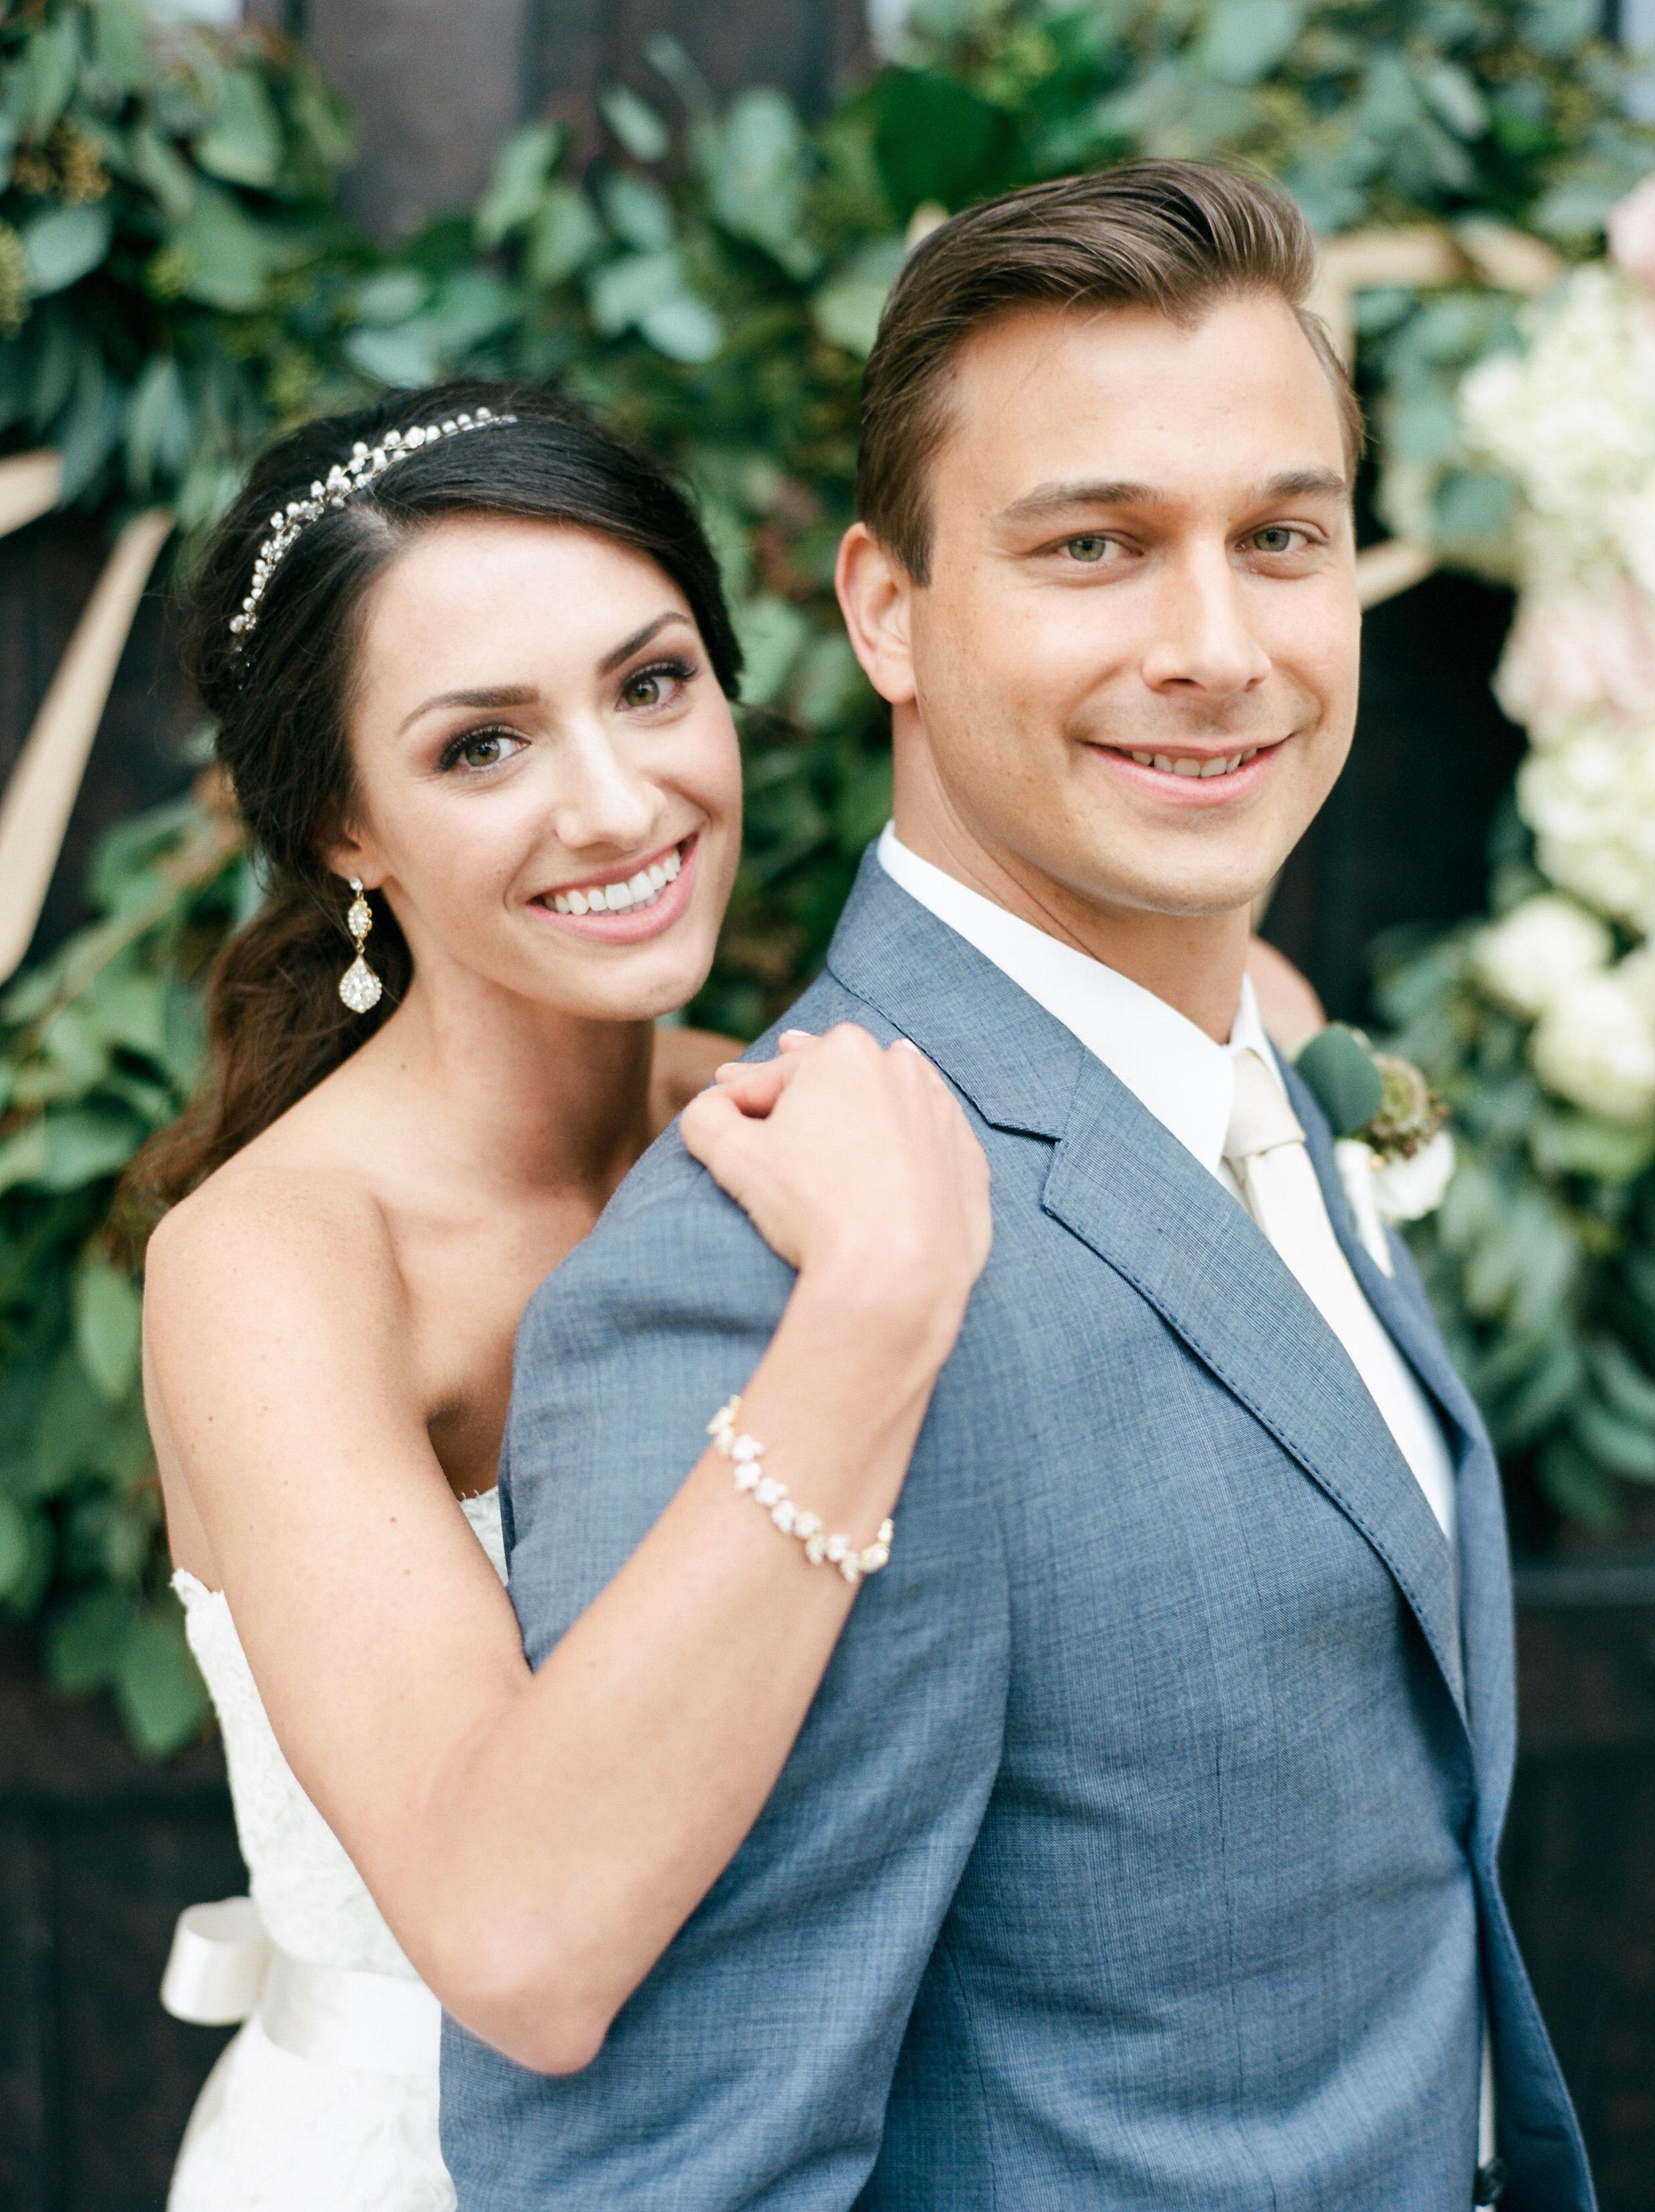 Briscoe-Manor-Houston-Wedding-Photographer-Modern-Luxury-Weddings-Dana-Fernandez-Photograpy-Fine-Art-Photographer-Houston-Film-Destination-PNW-Wedding-Photographer-25.jpg